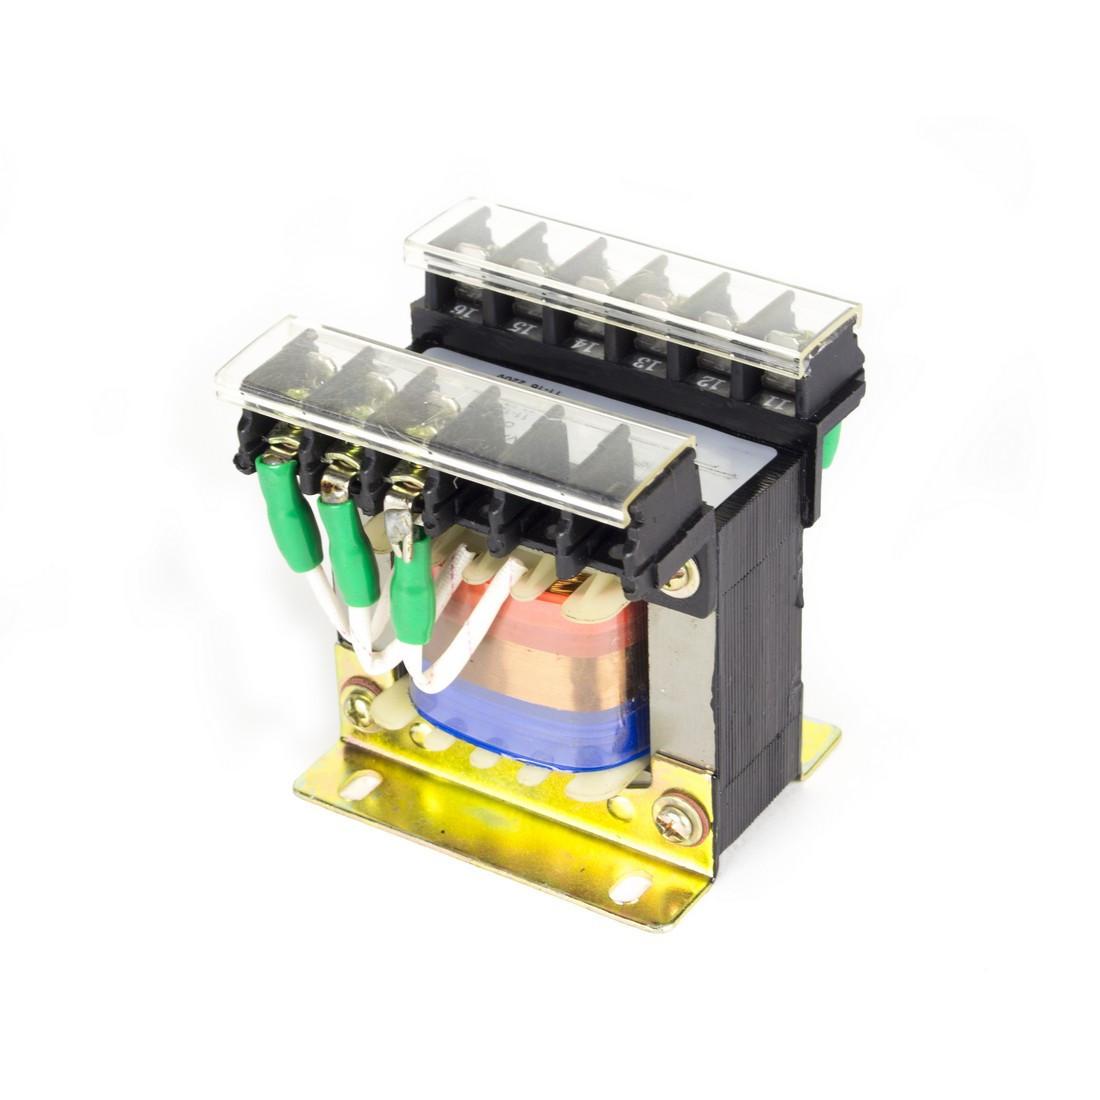 Трансформатор понижающий iPower JBK3-63 VA - фото 2